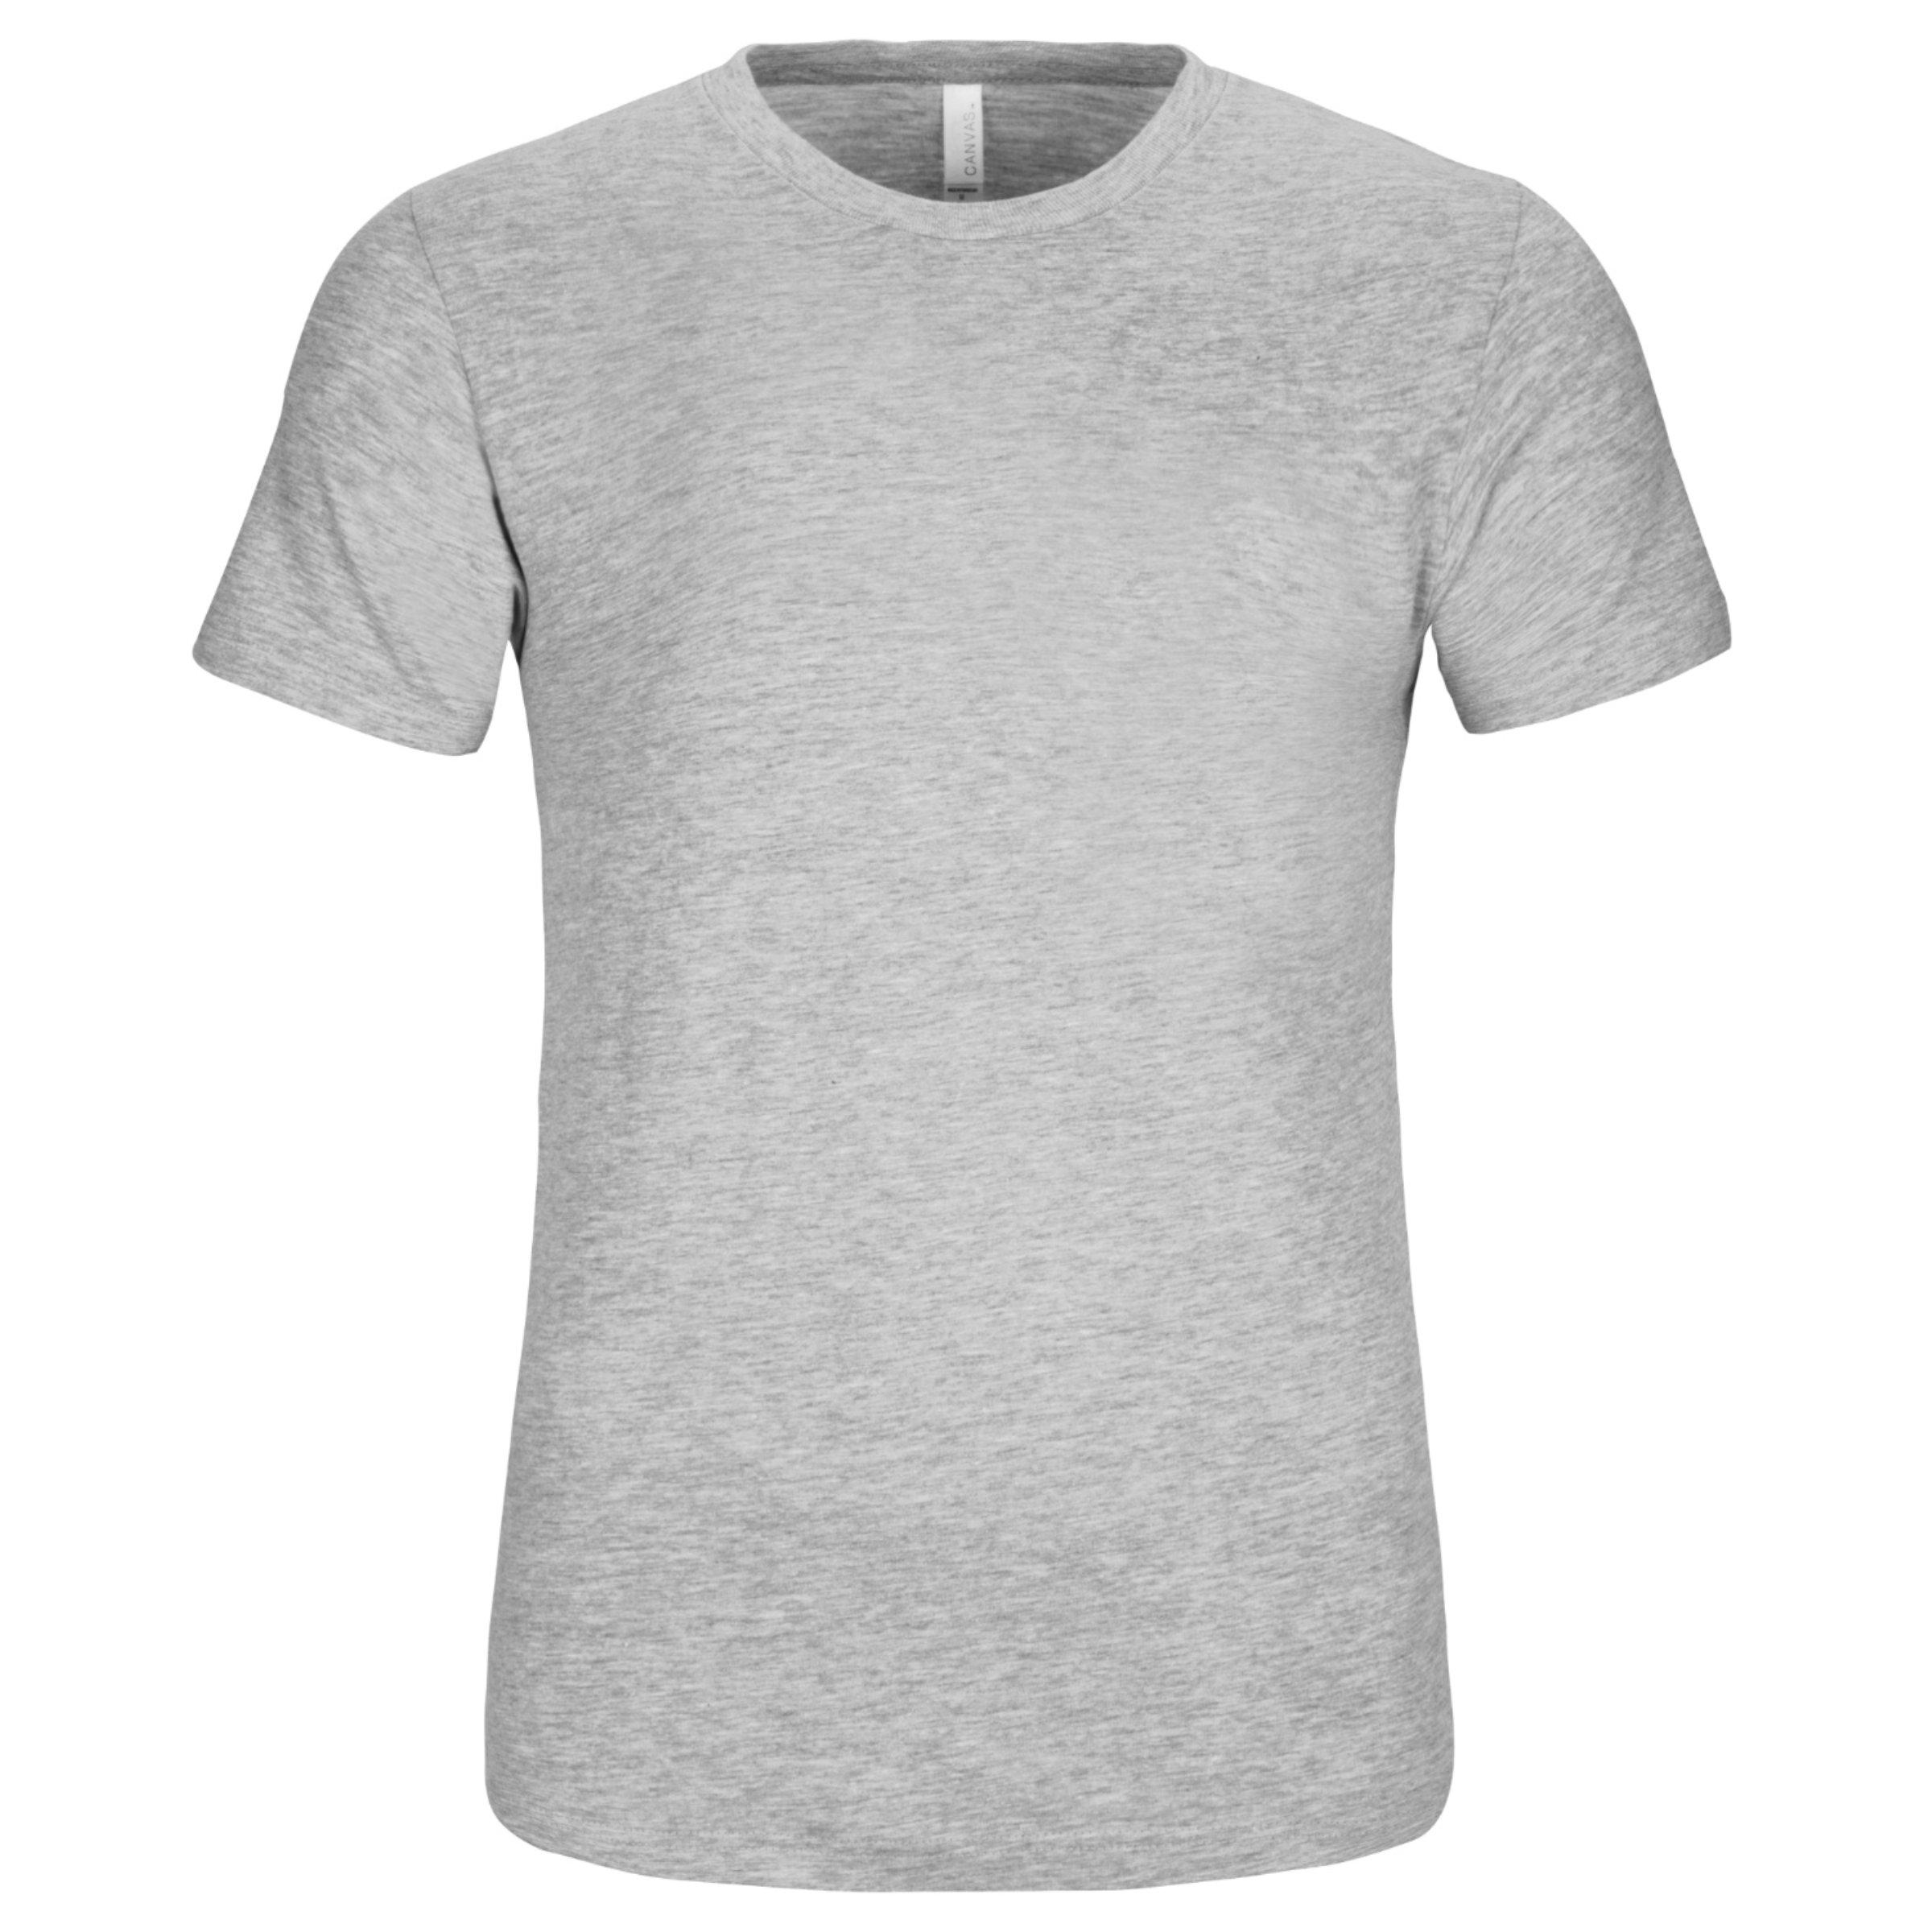 Shirts - US Availability